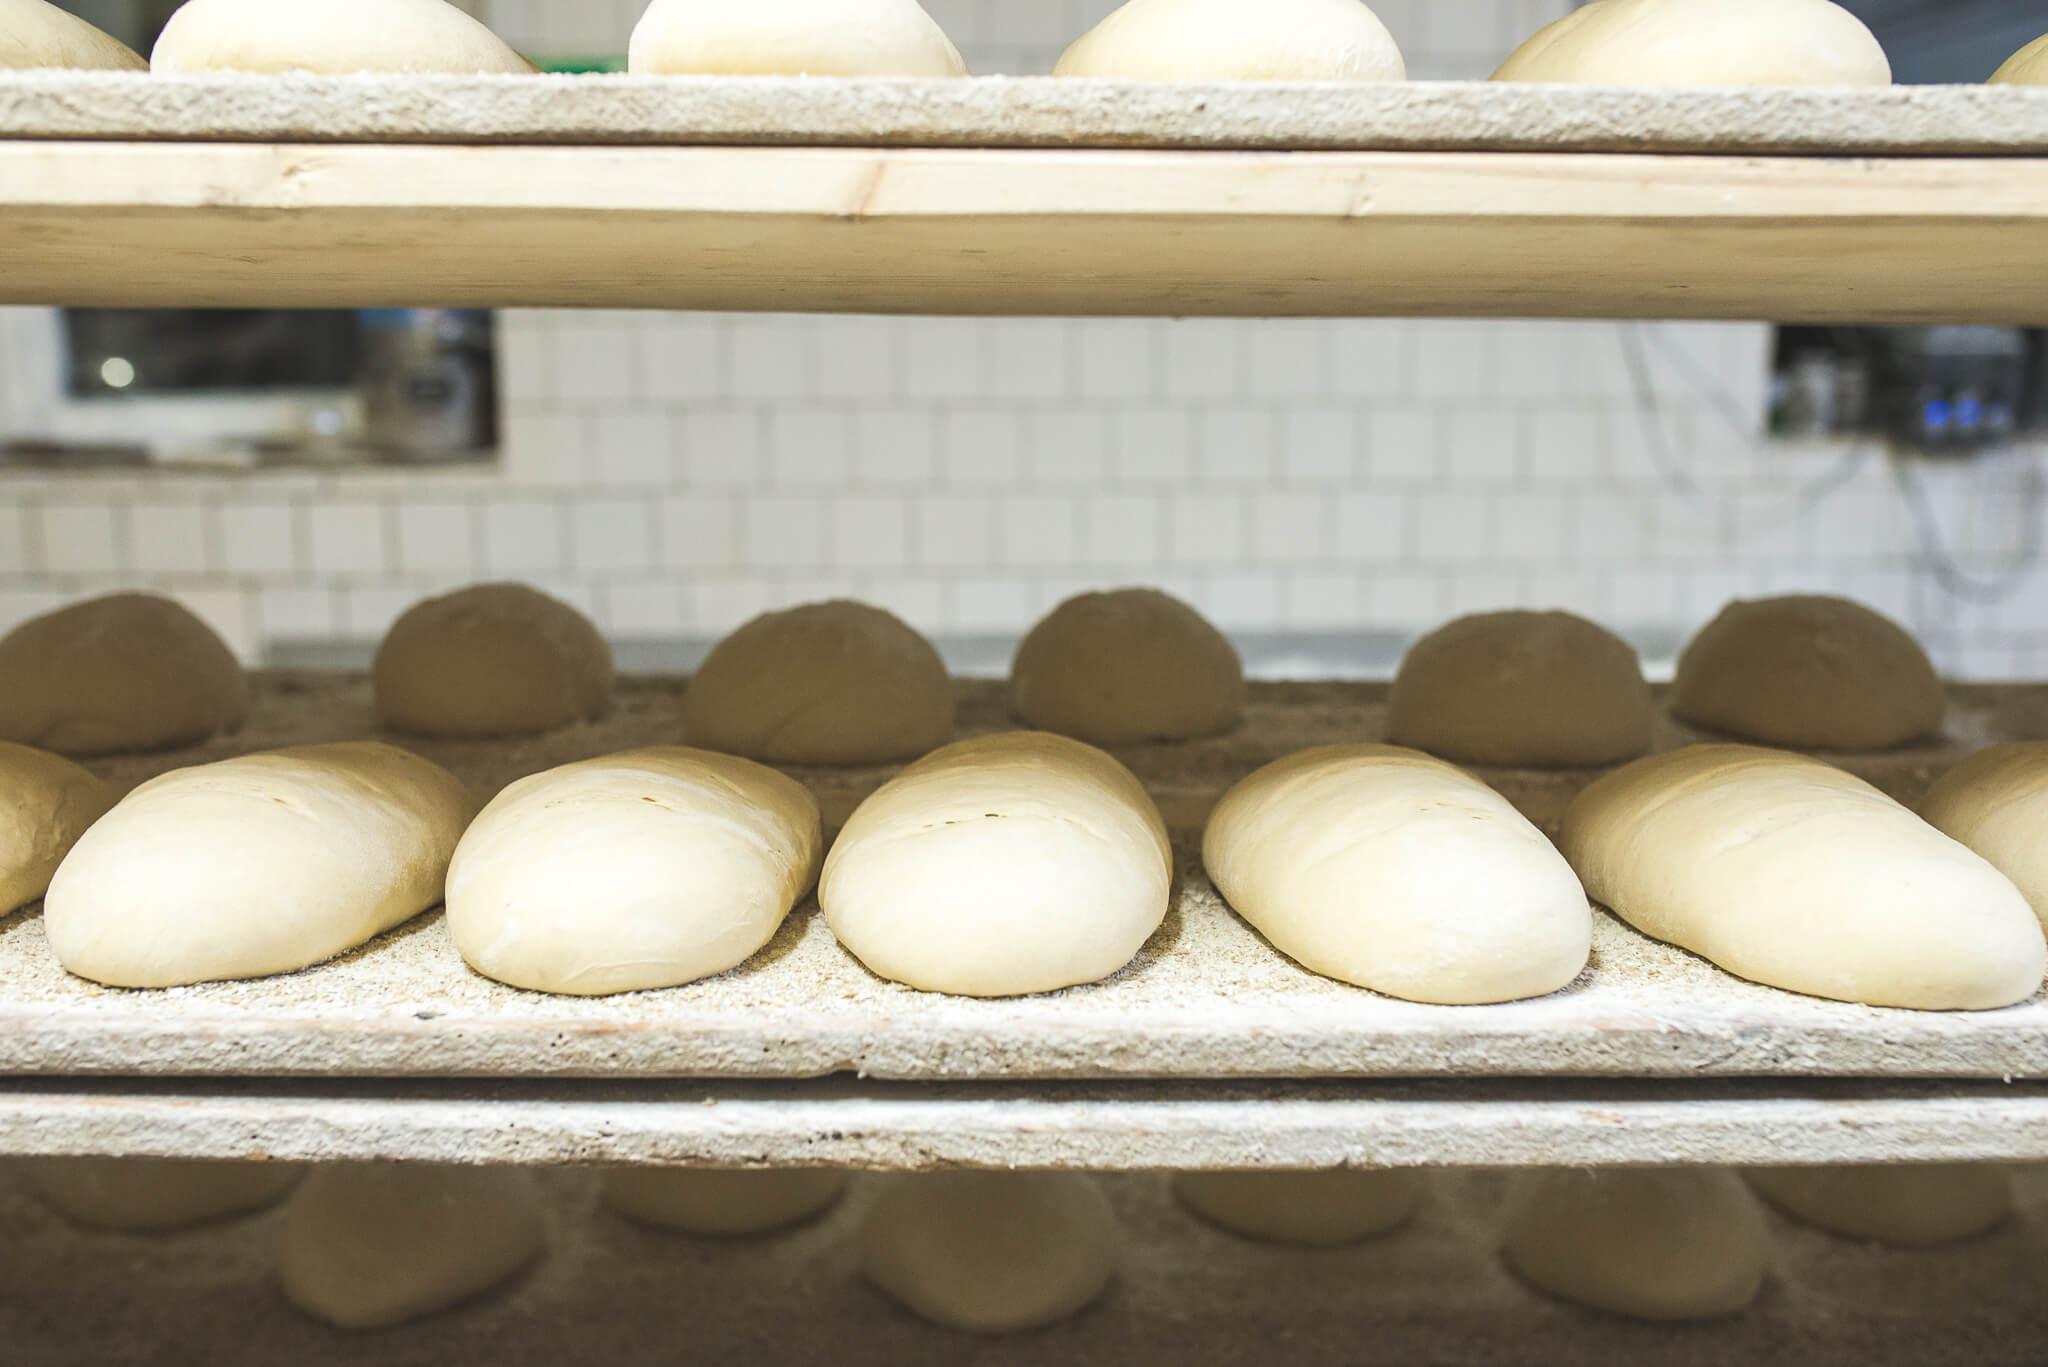 Majchrowski 21 1 - Artisan bread in pomorskie - tradition and modernity